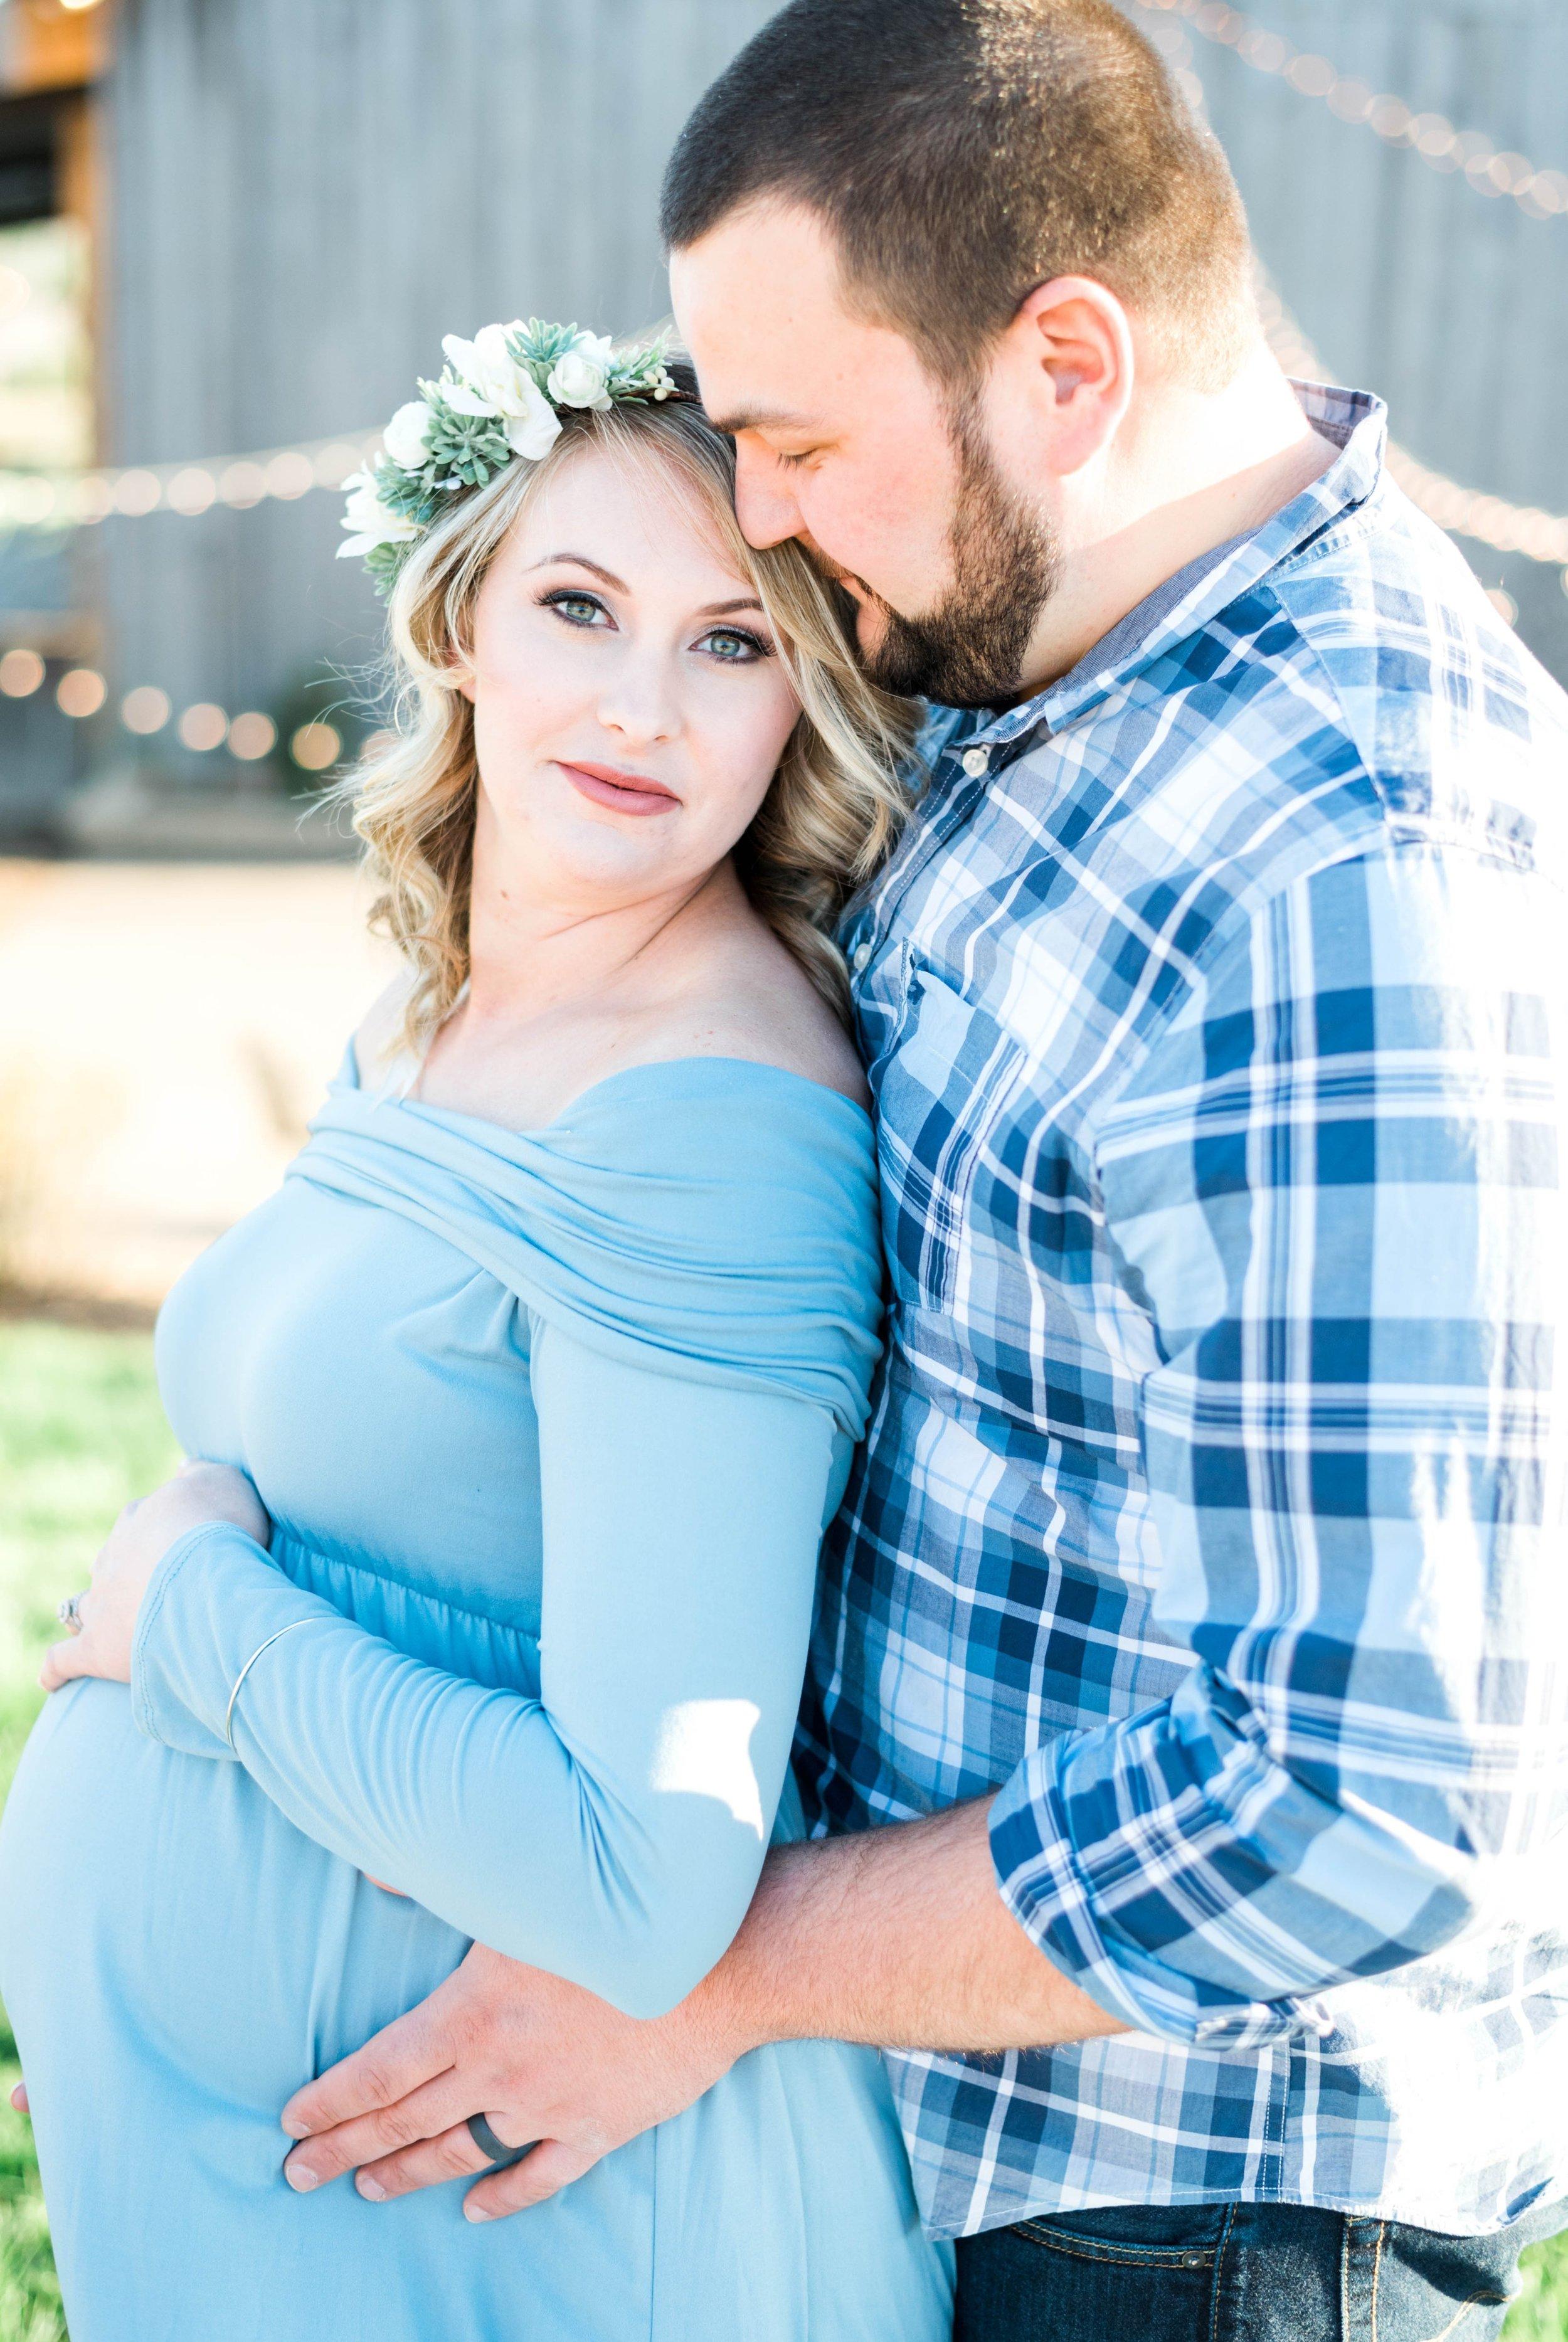 SorellaFarms_Jessica+Dylan_MaternitySession_Virginiaweddingphotographer 18.jpg